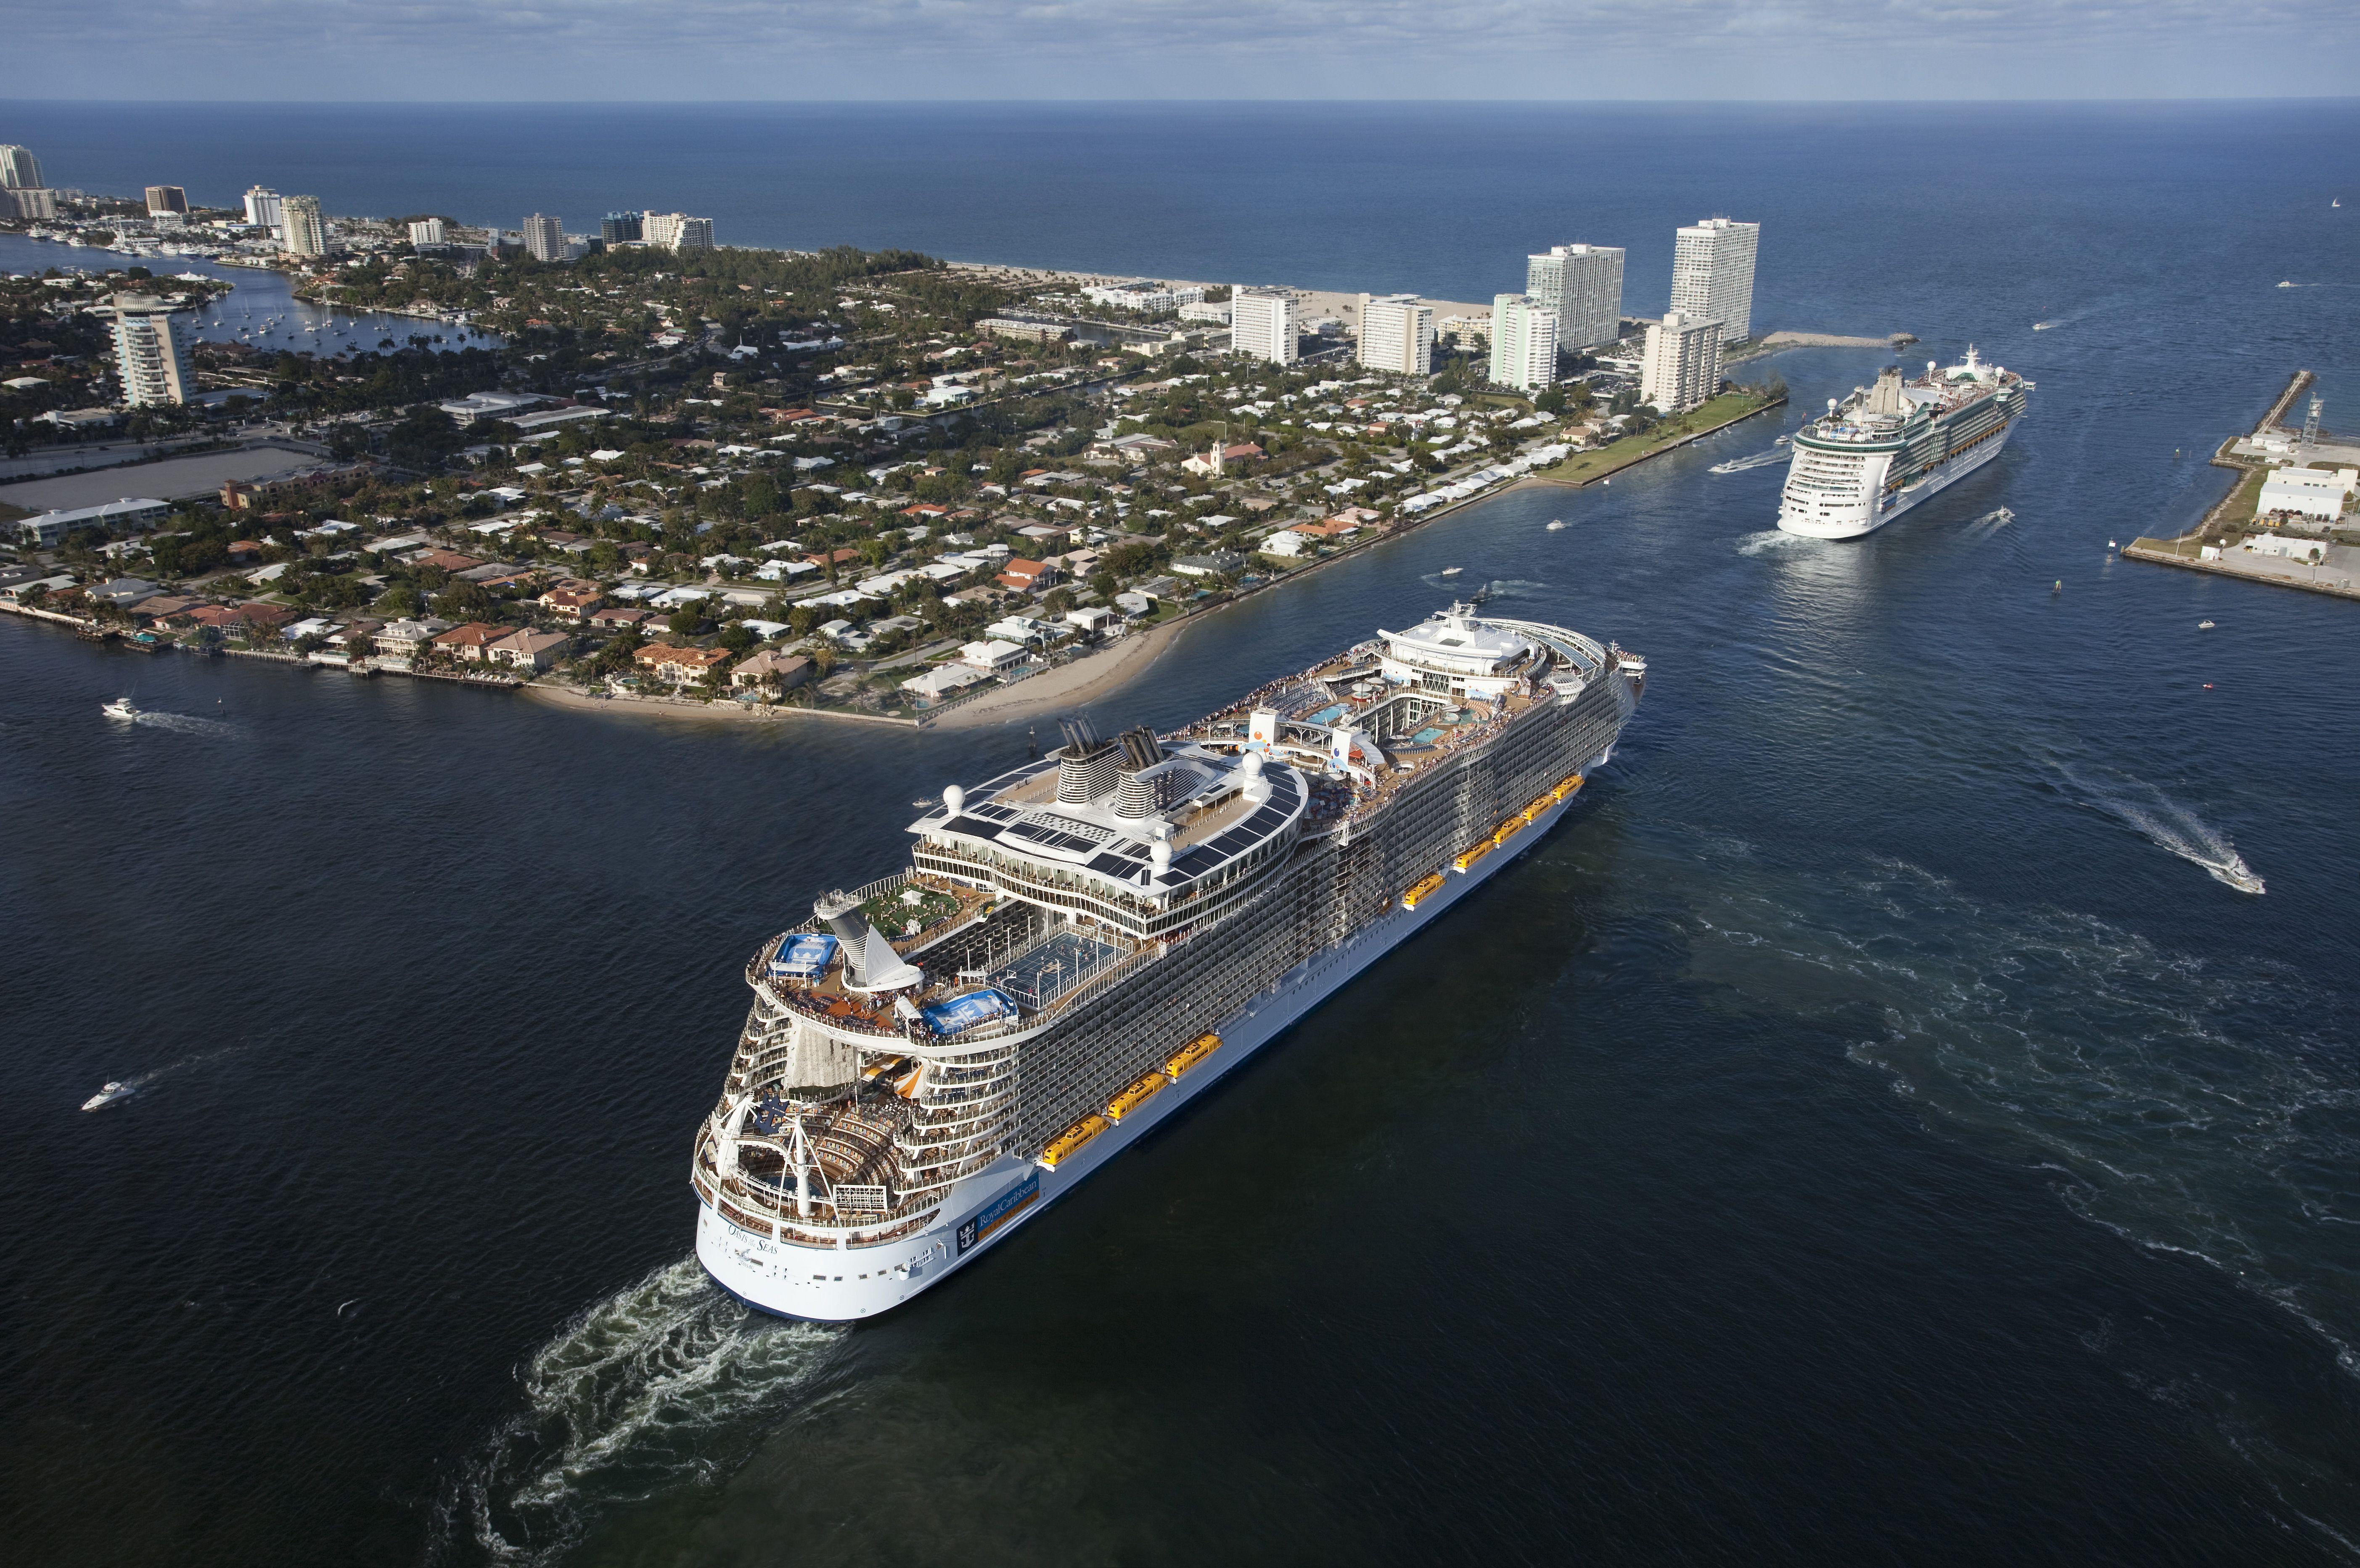 Royal Caribbean S Harmony Of The Seas Coming April 2016 In 2020 Royal Caribbean Cruise Royal Caribbean Cruise Ship Royal Caribbean International